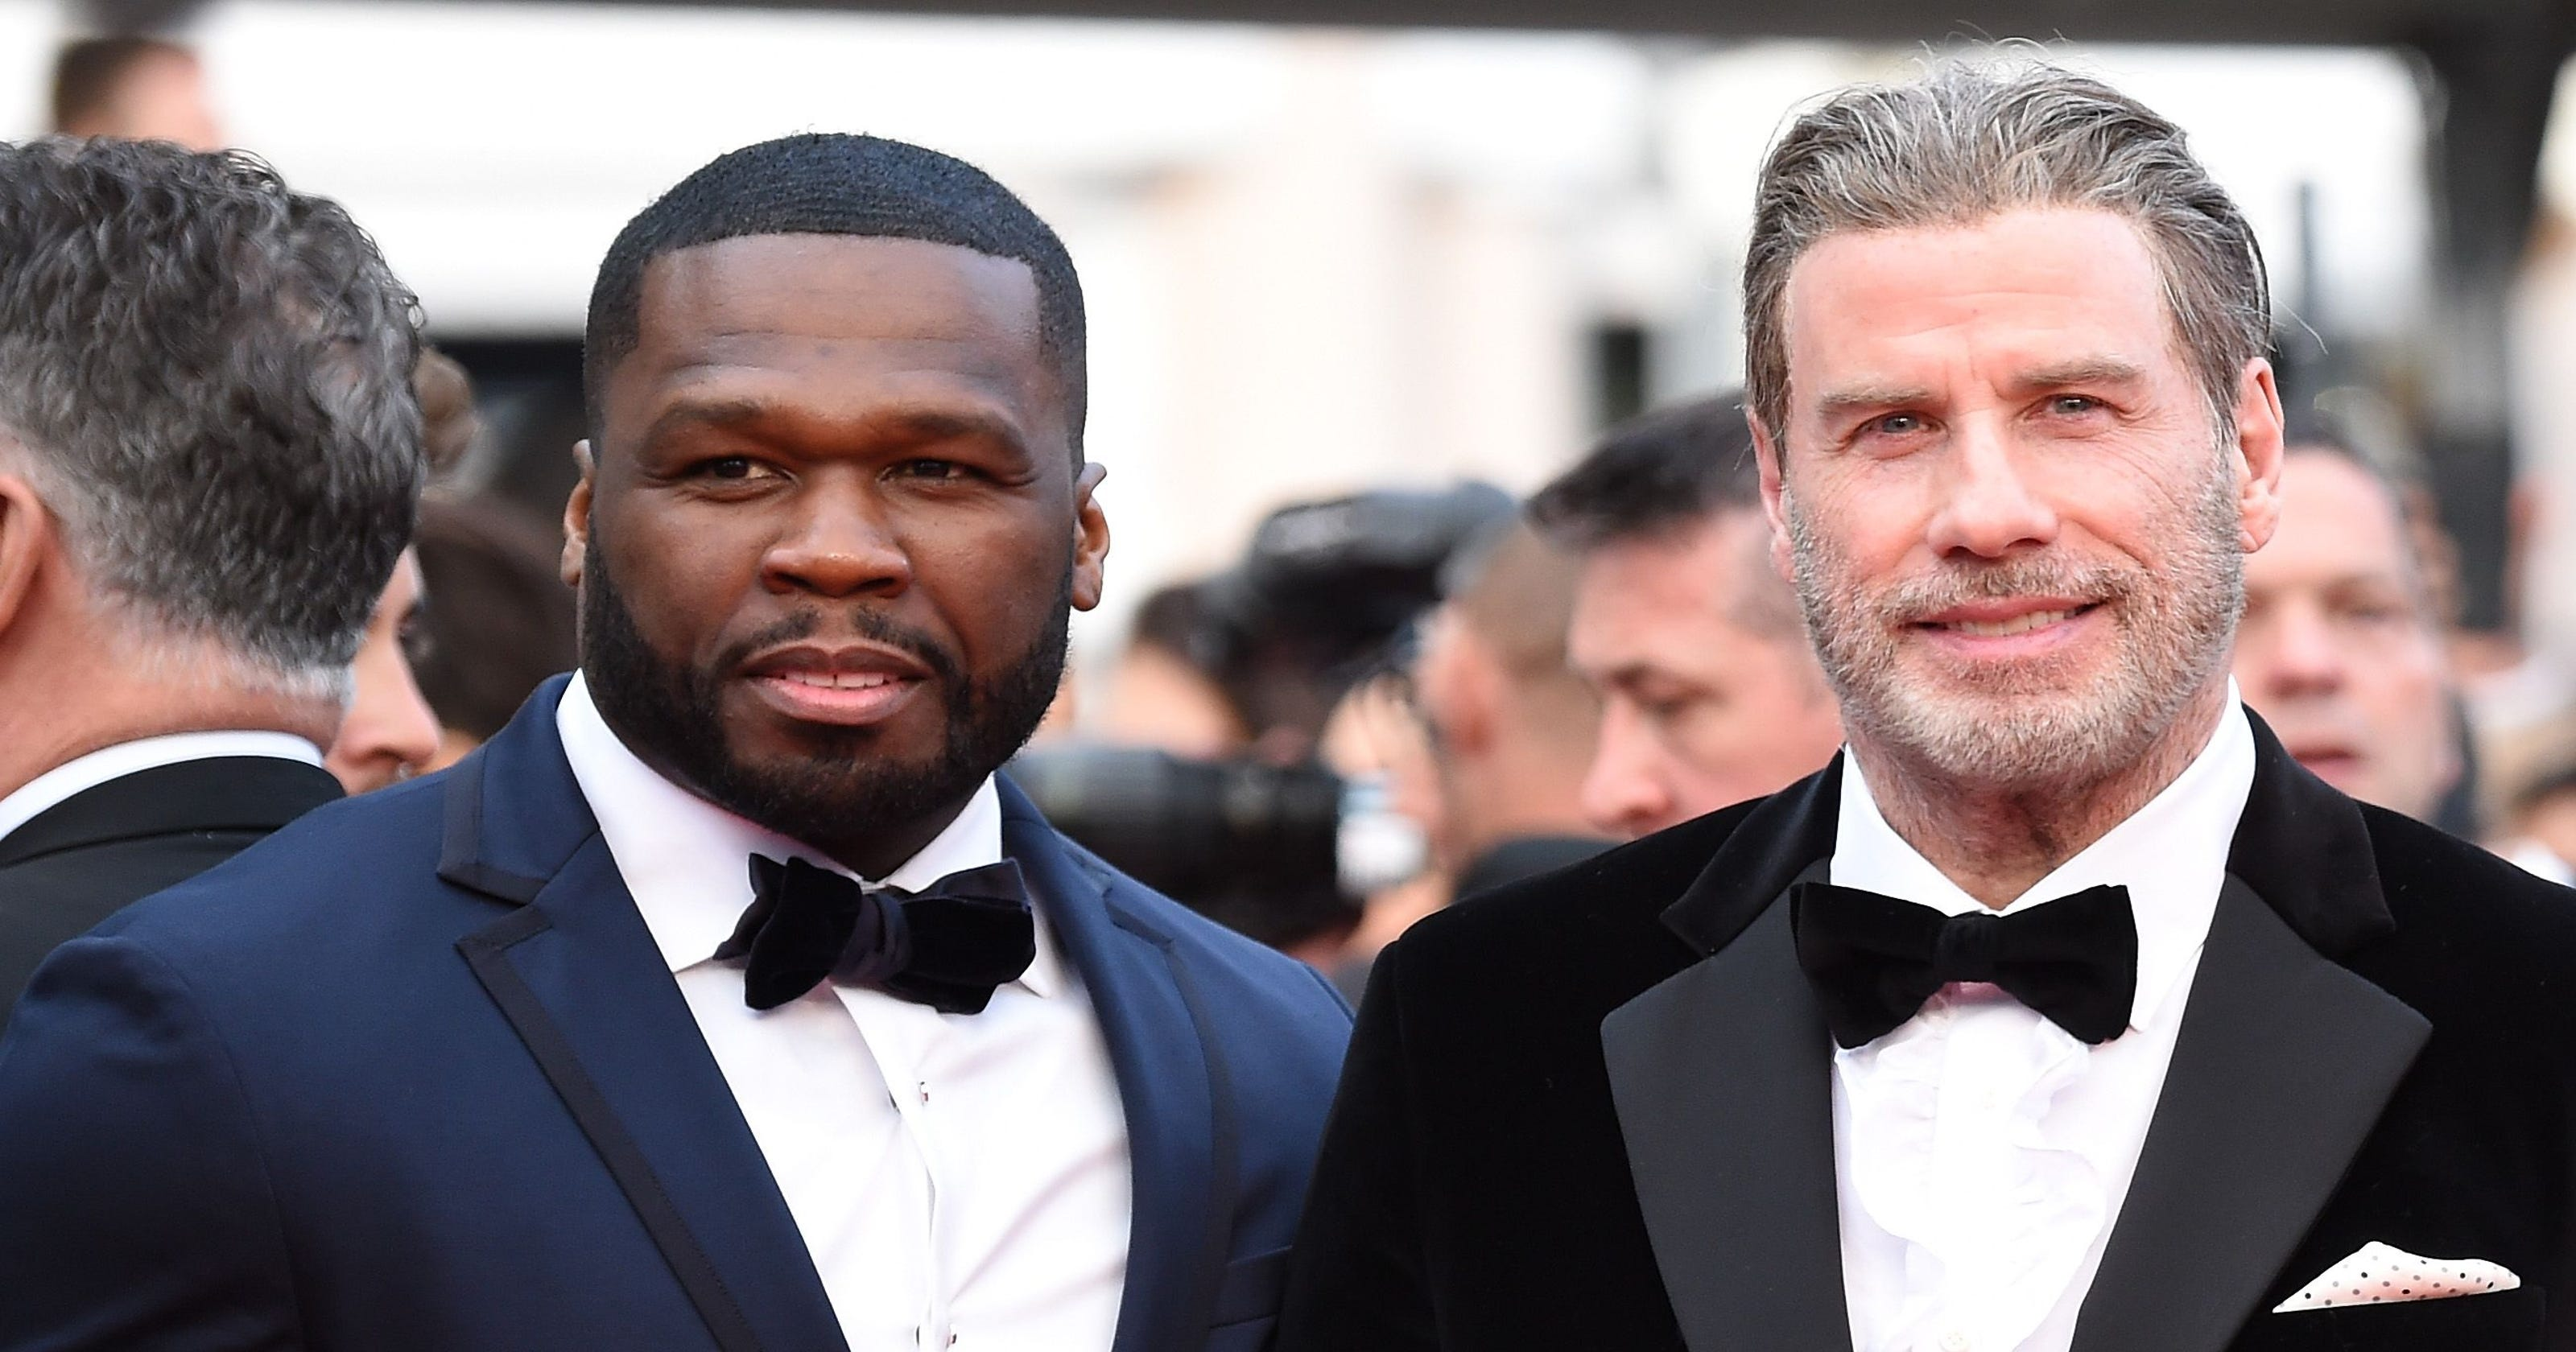 John Travolta explains his viral dance moment with rapper 50 Cent